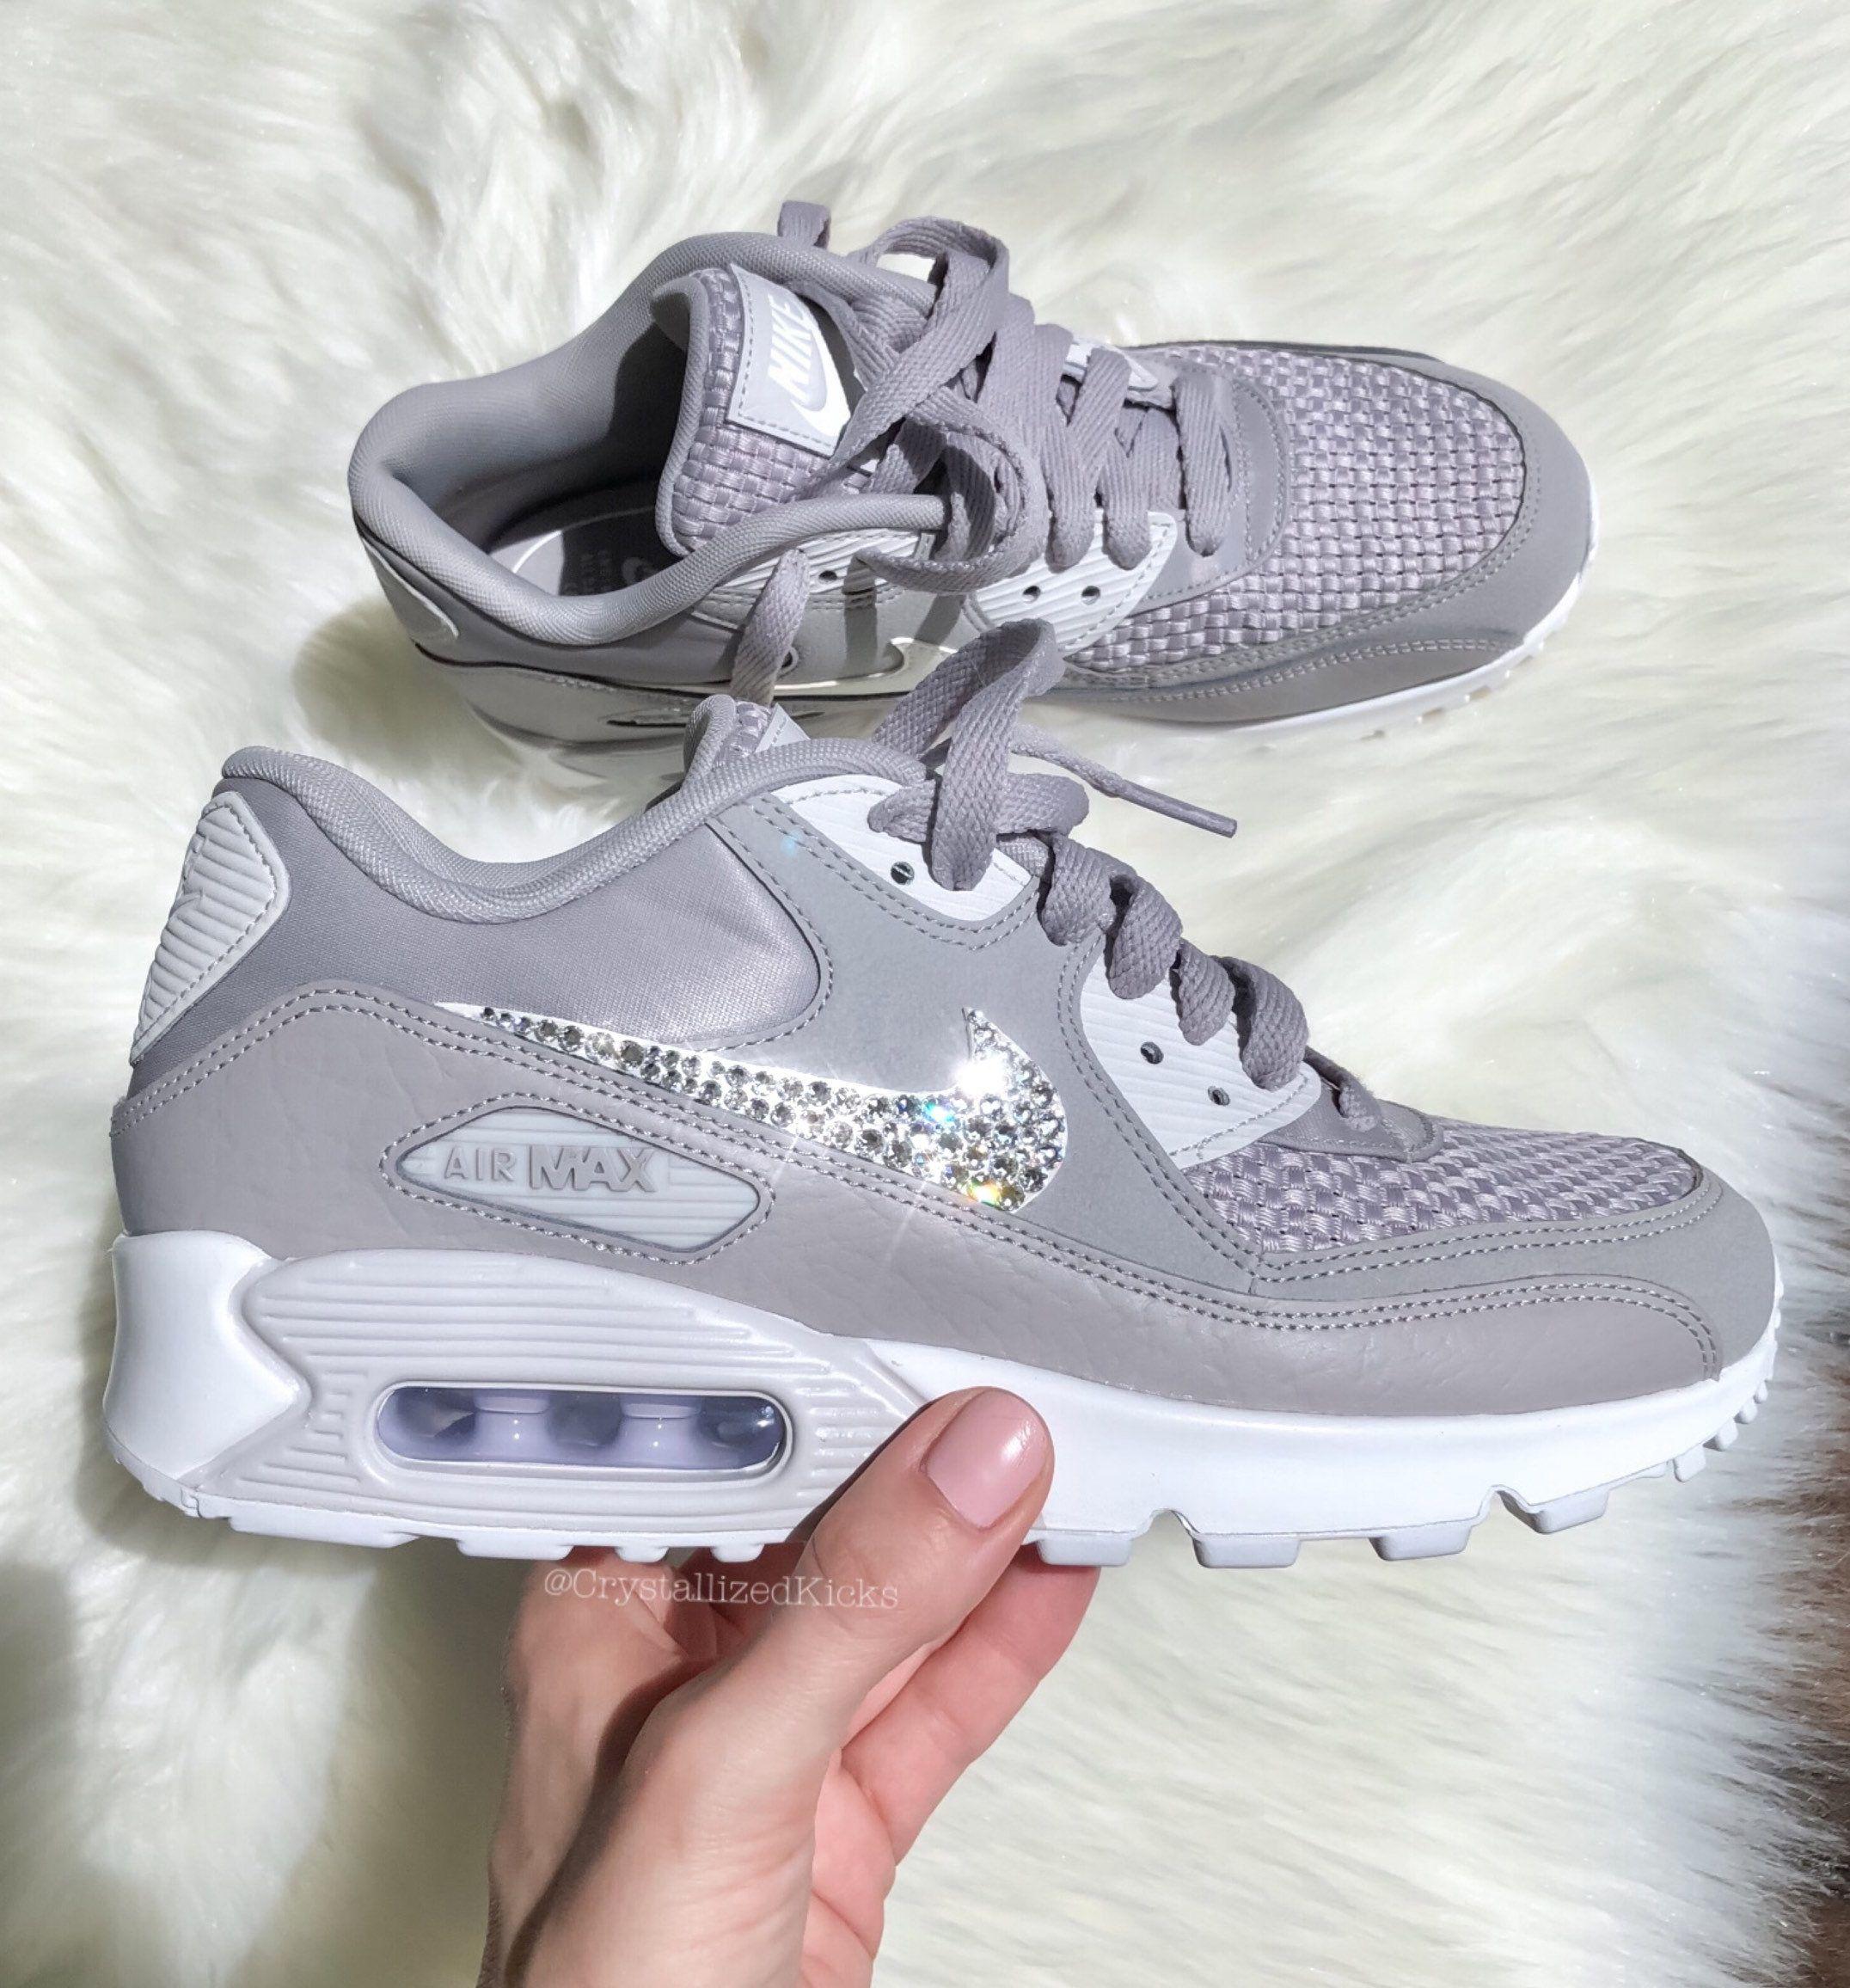 best service 32ef9 85100 Nike Air Max 90 Crystal